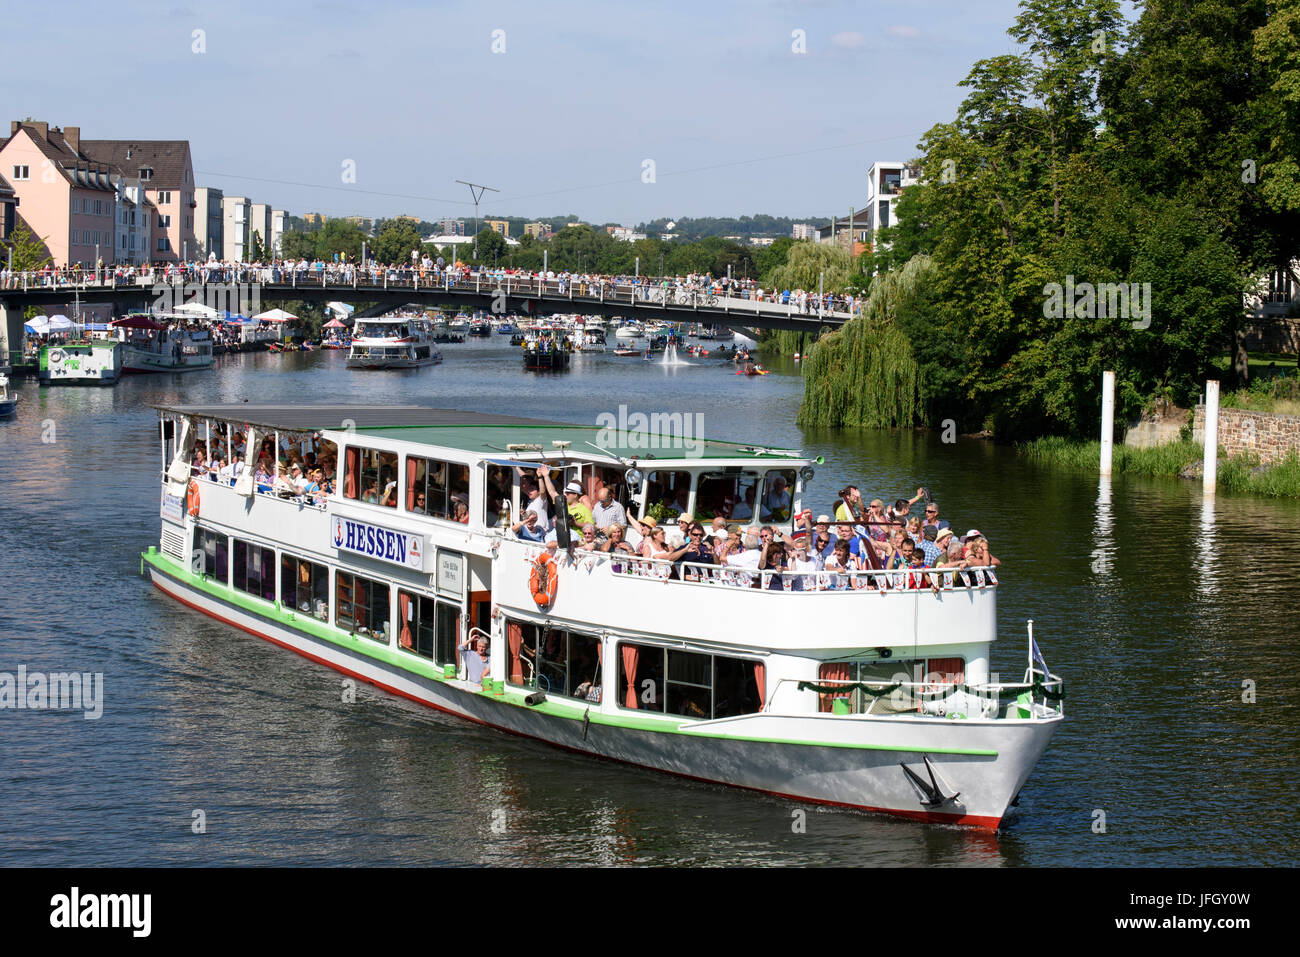 Passenger ship, public festival Zissel, water procession on Fulda, Kassel, Hessen, Germany - Stock Image